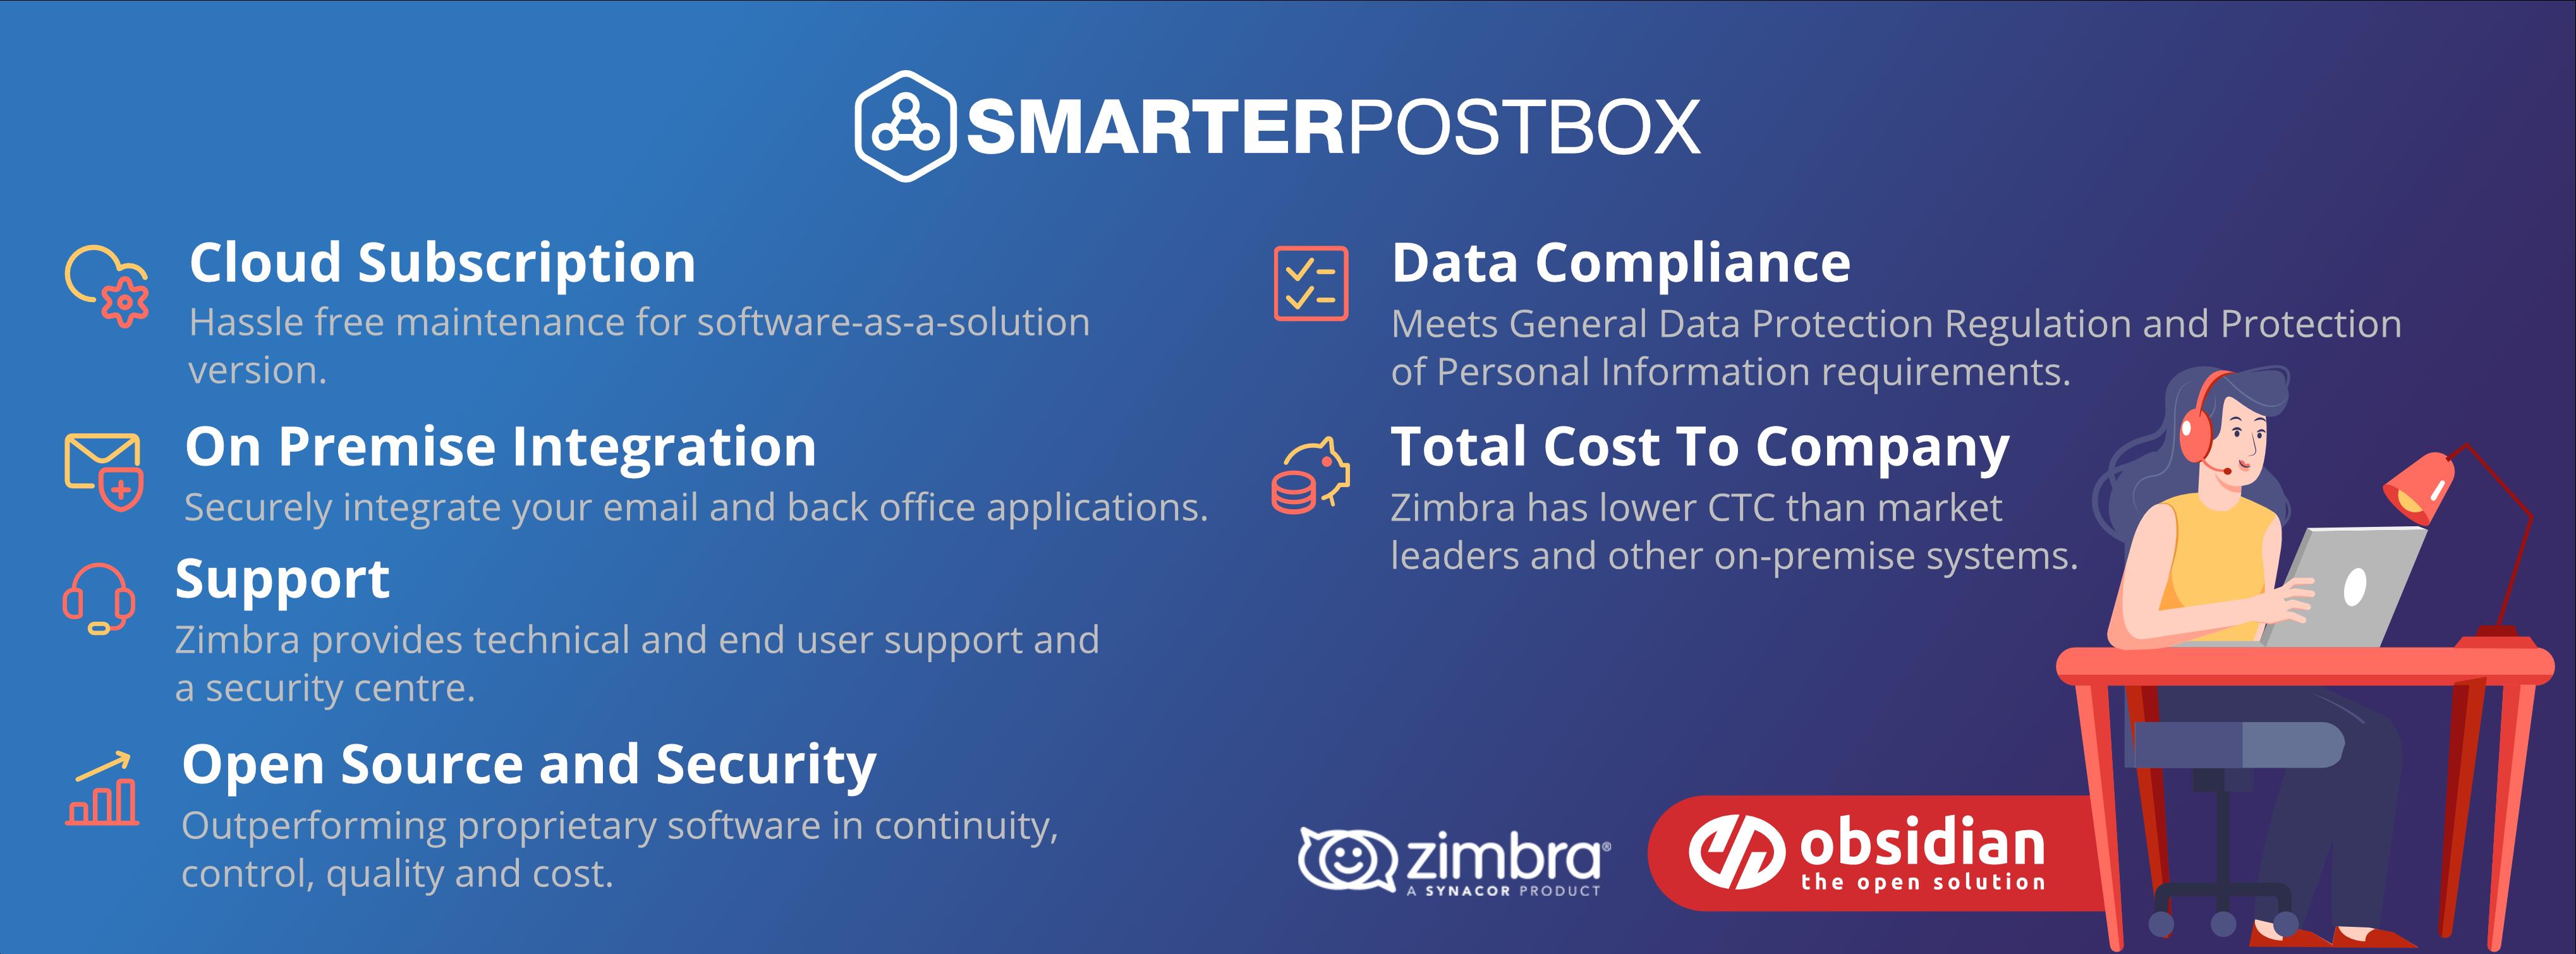 SmarterPostbox with Zimbra